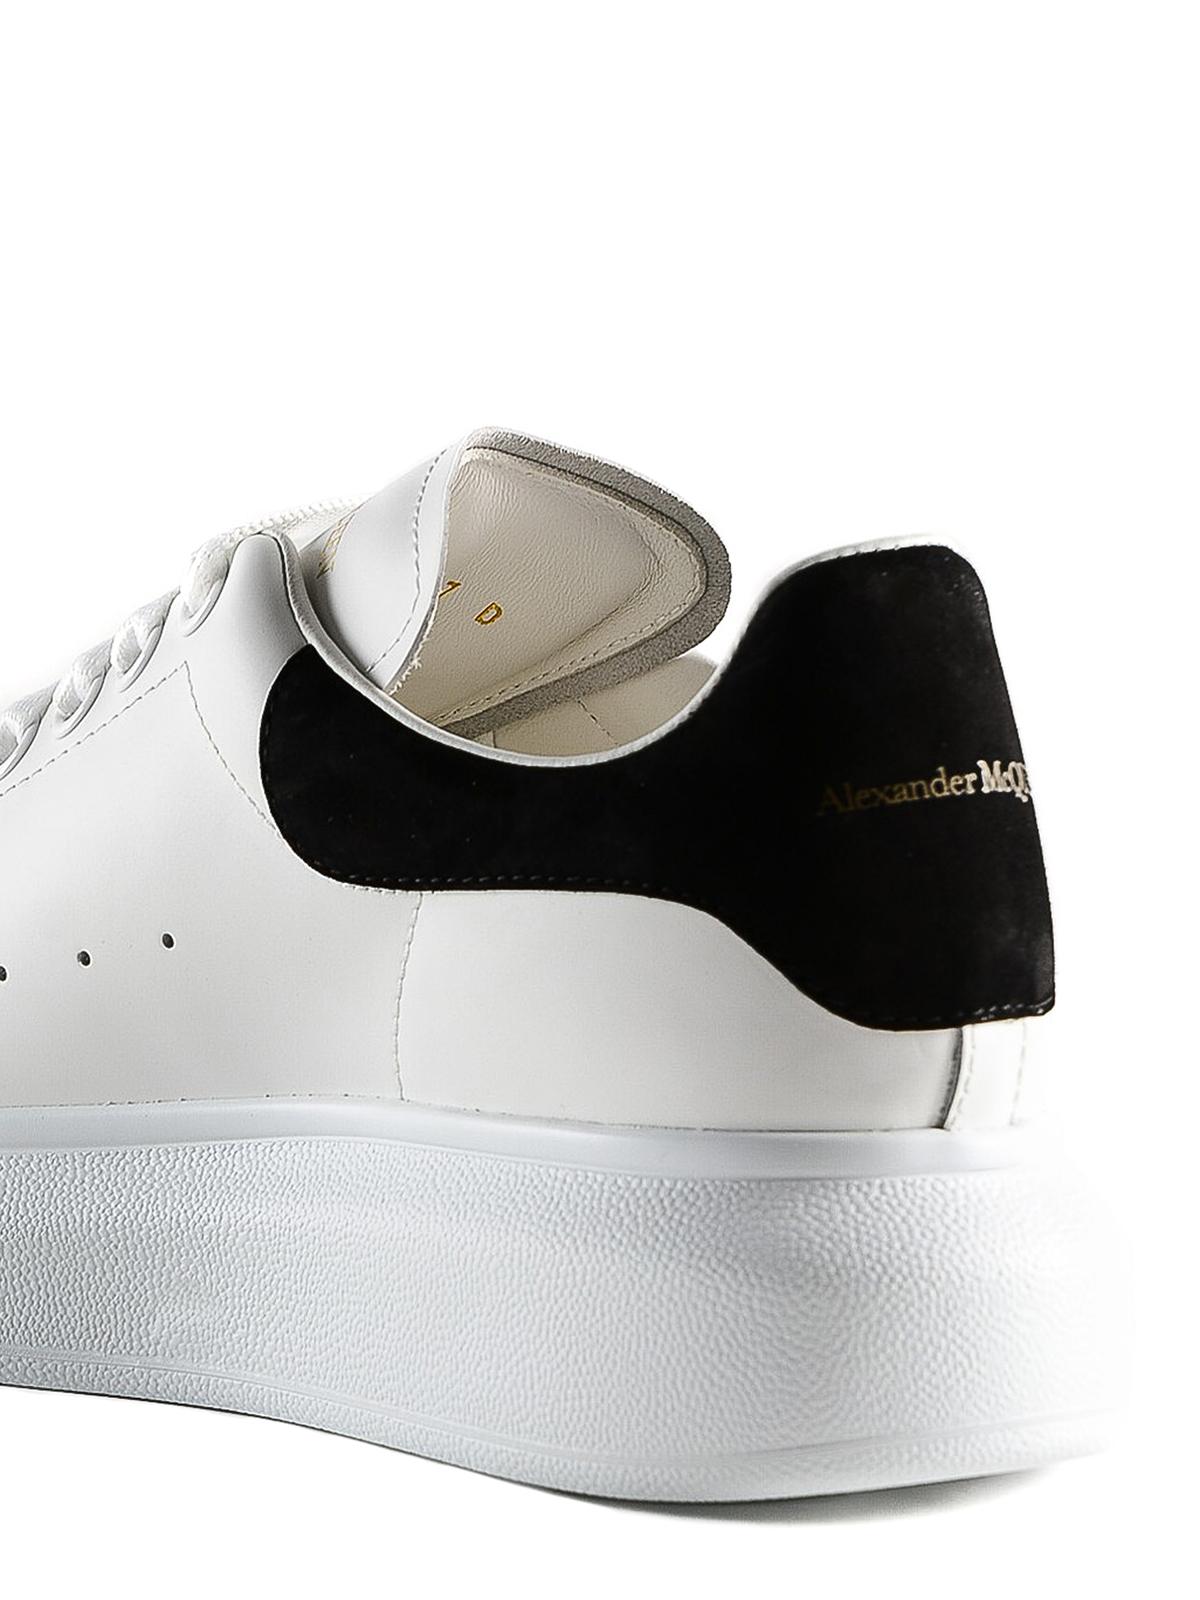 Alexander Mcqueen - Sneaker Oversize bianche e nere ...